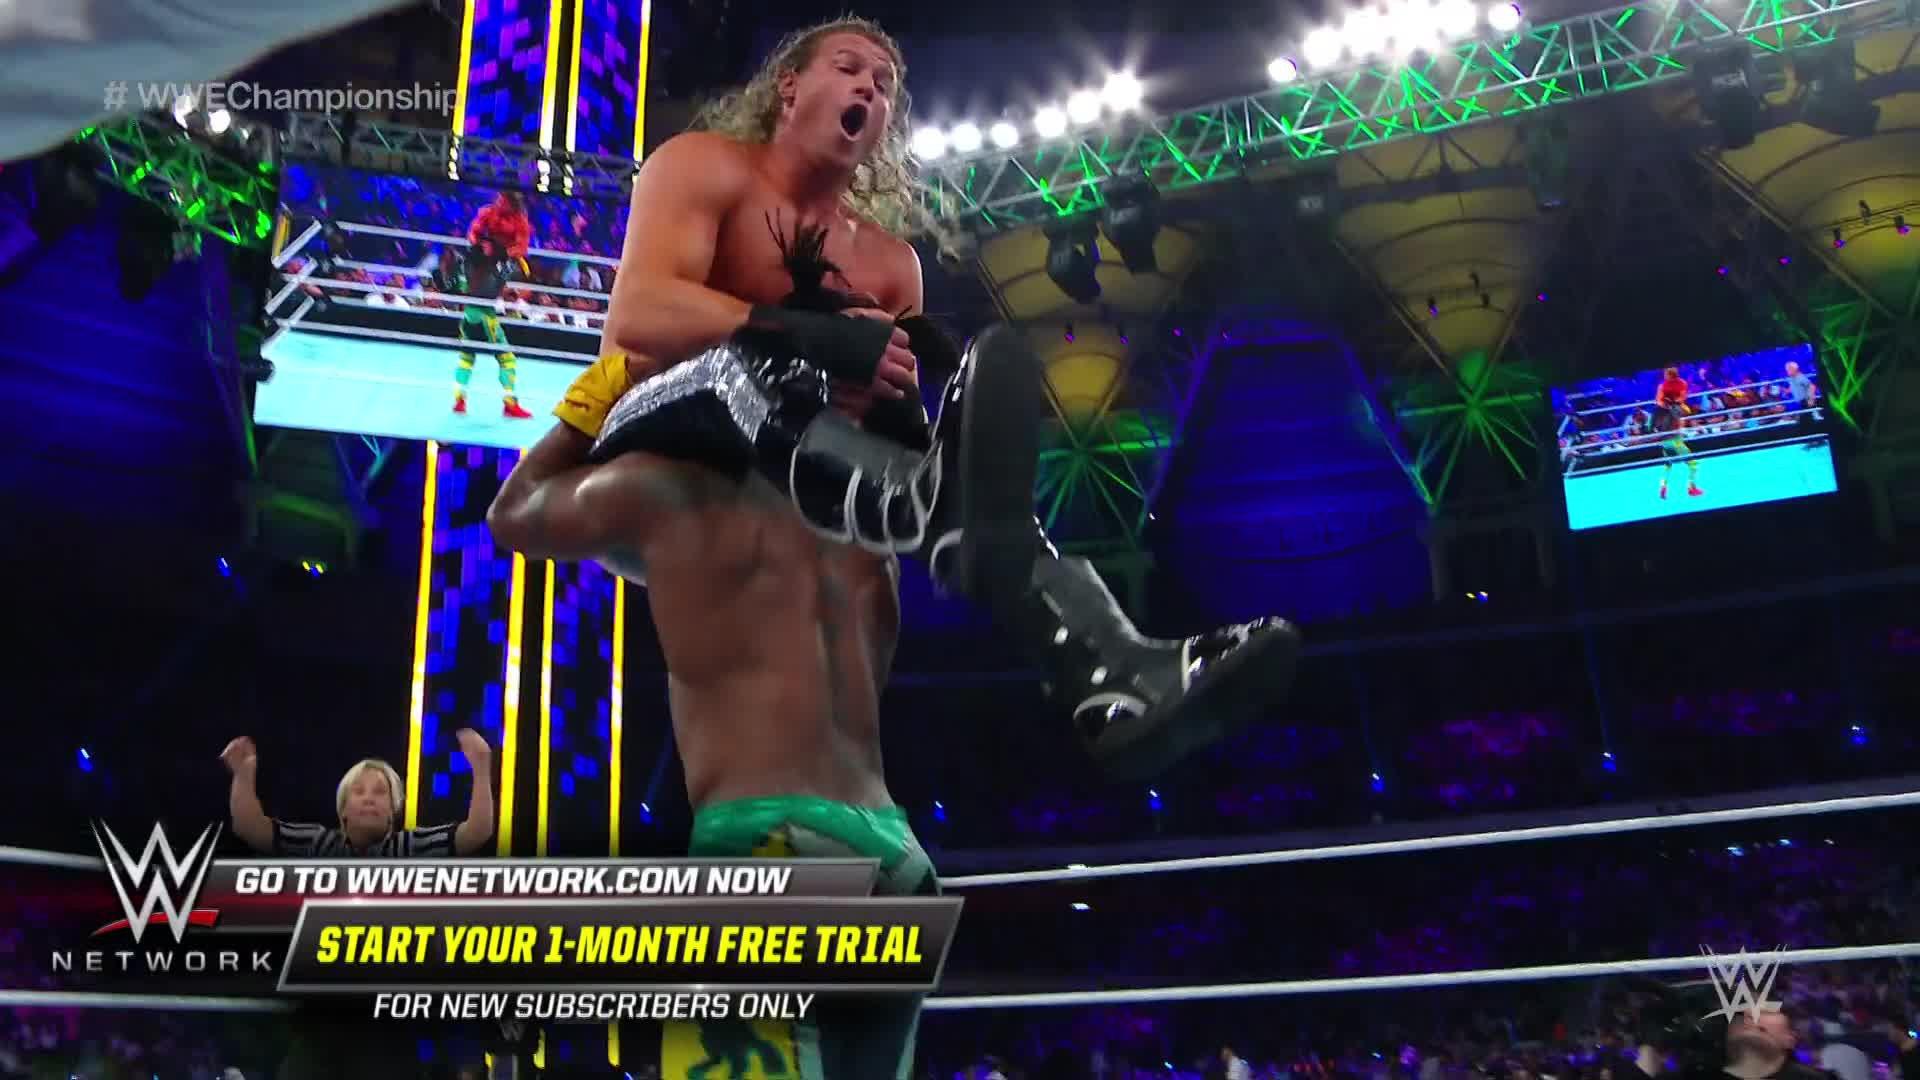 Kofi Kingston détruit Dolph Ziggler avec un S.O.S.: WWE Super ShowDown 2019